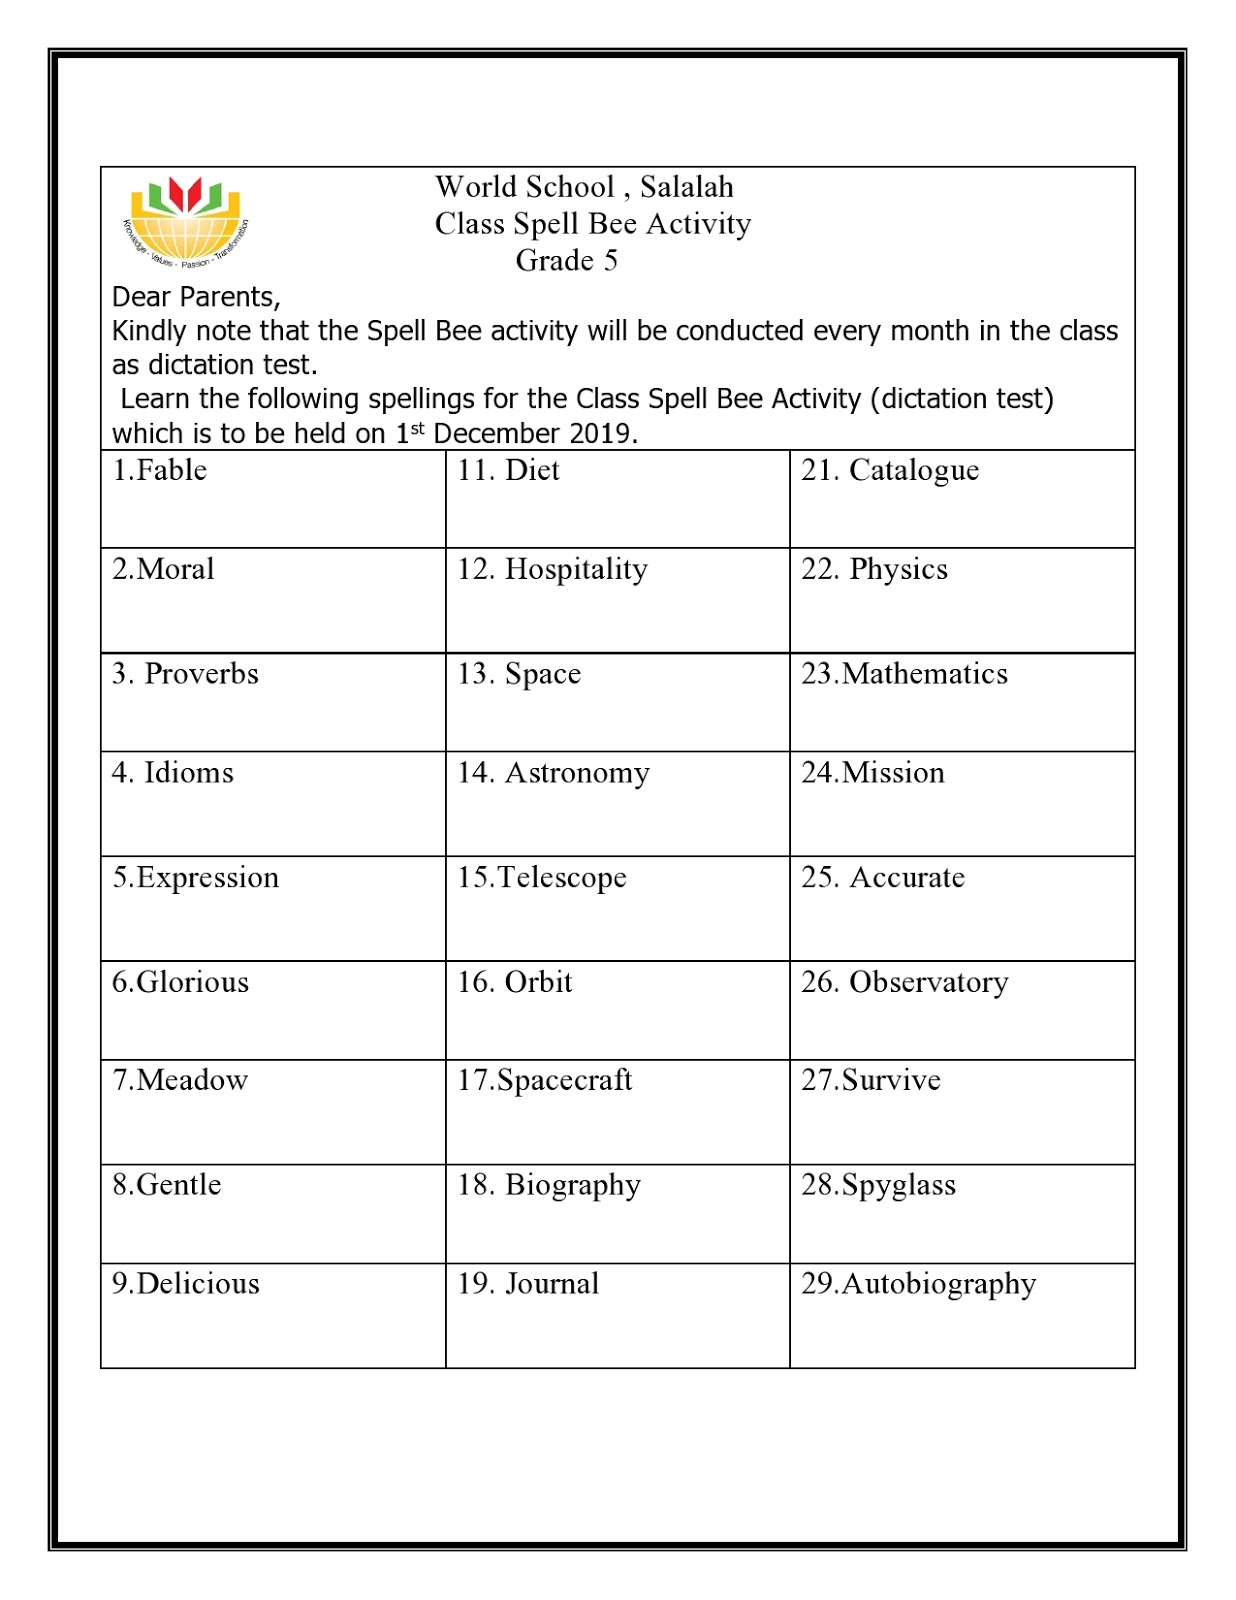 small resolution of WORLD SCHOOL OMAN: Homework for Grade 5 as on 12-11-2019